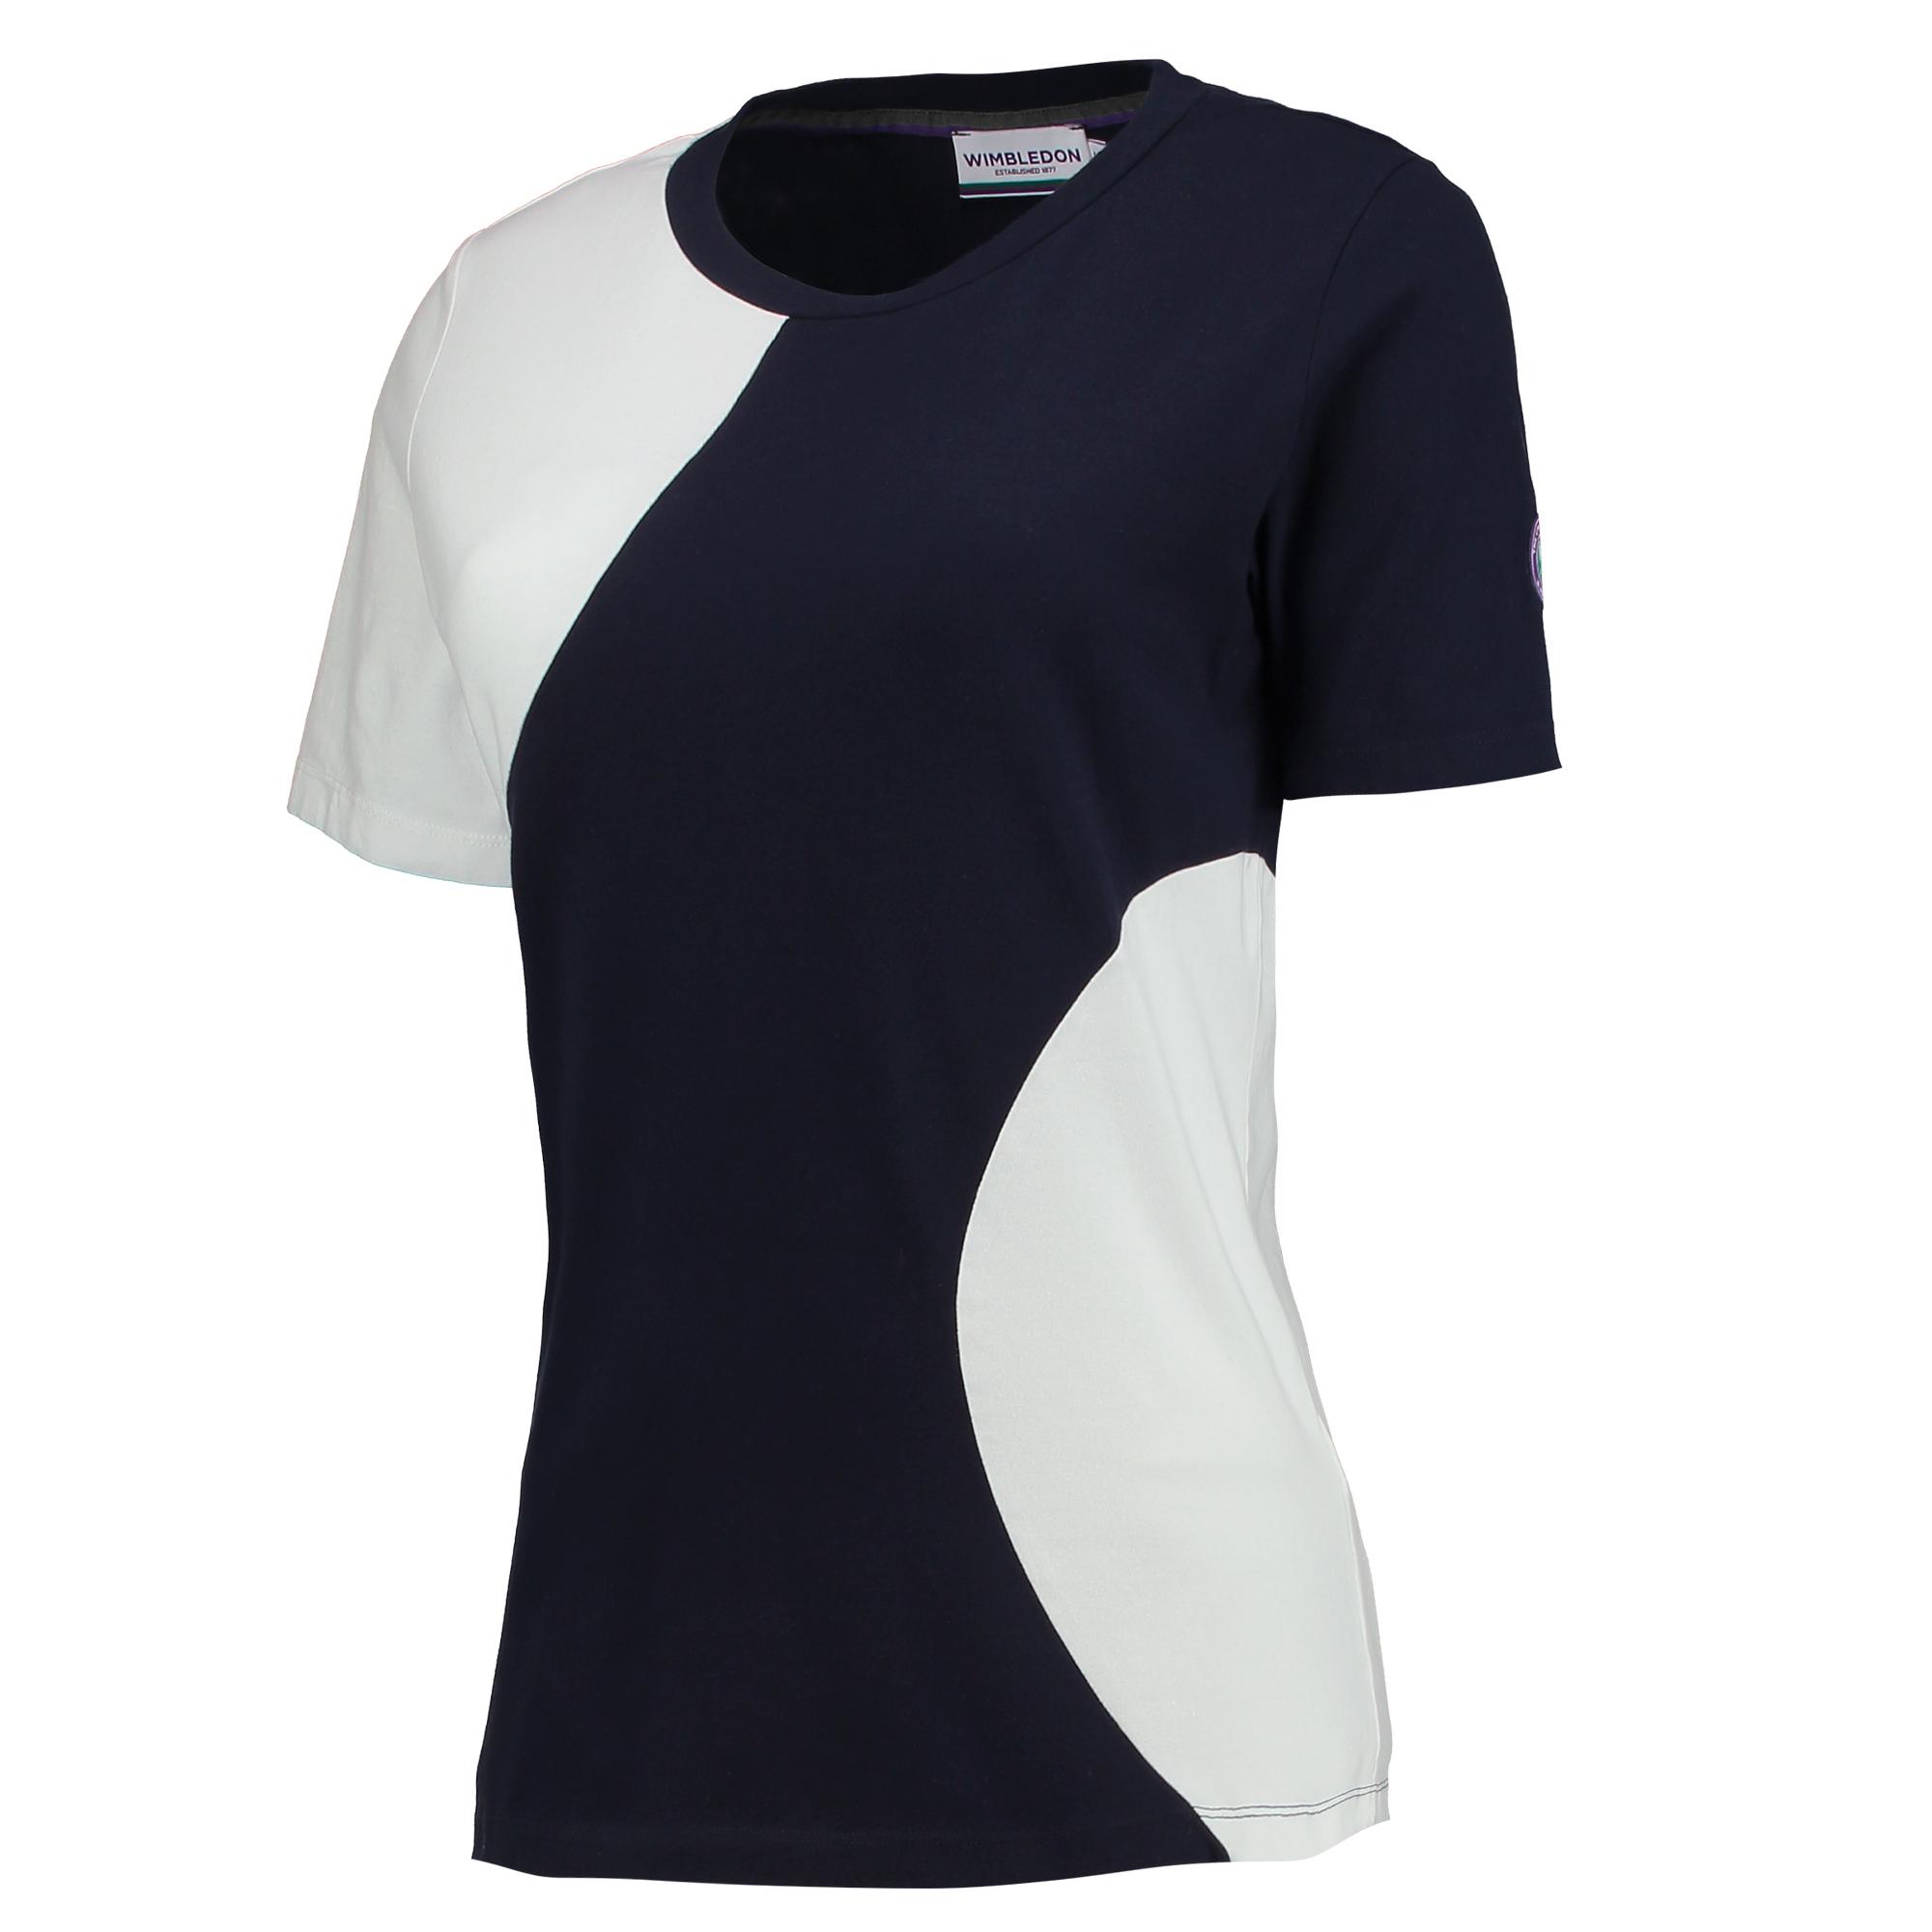 Wimbledon Logo T-Shirt - Ladies